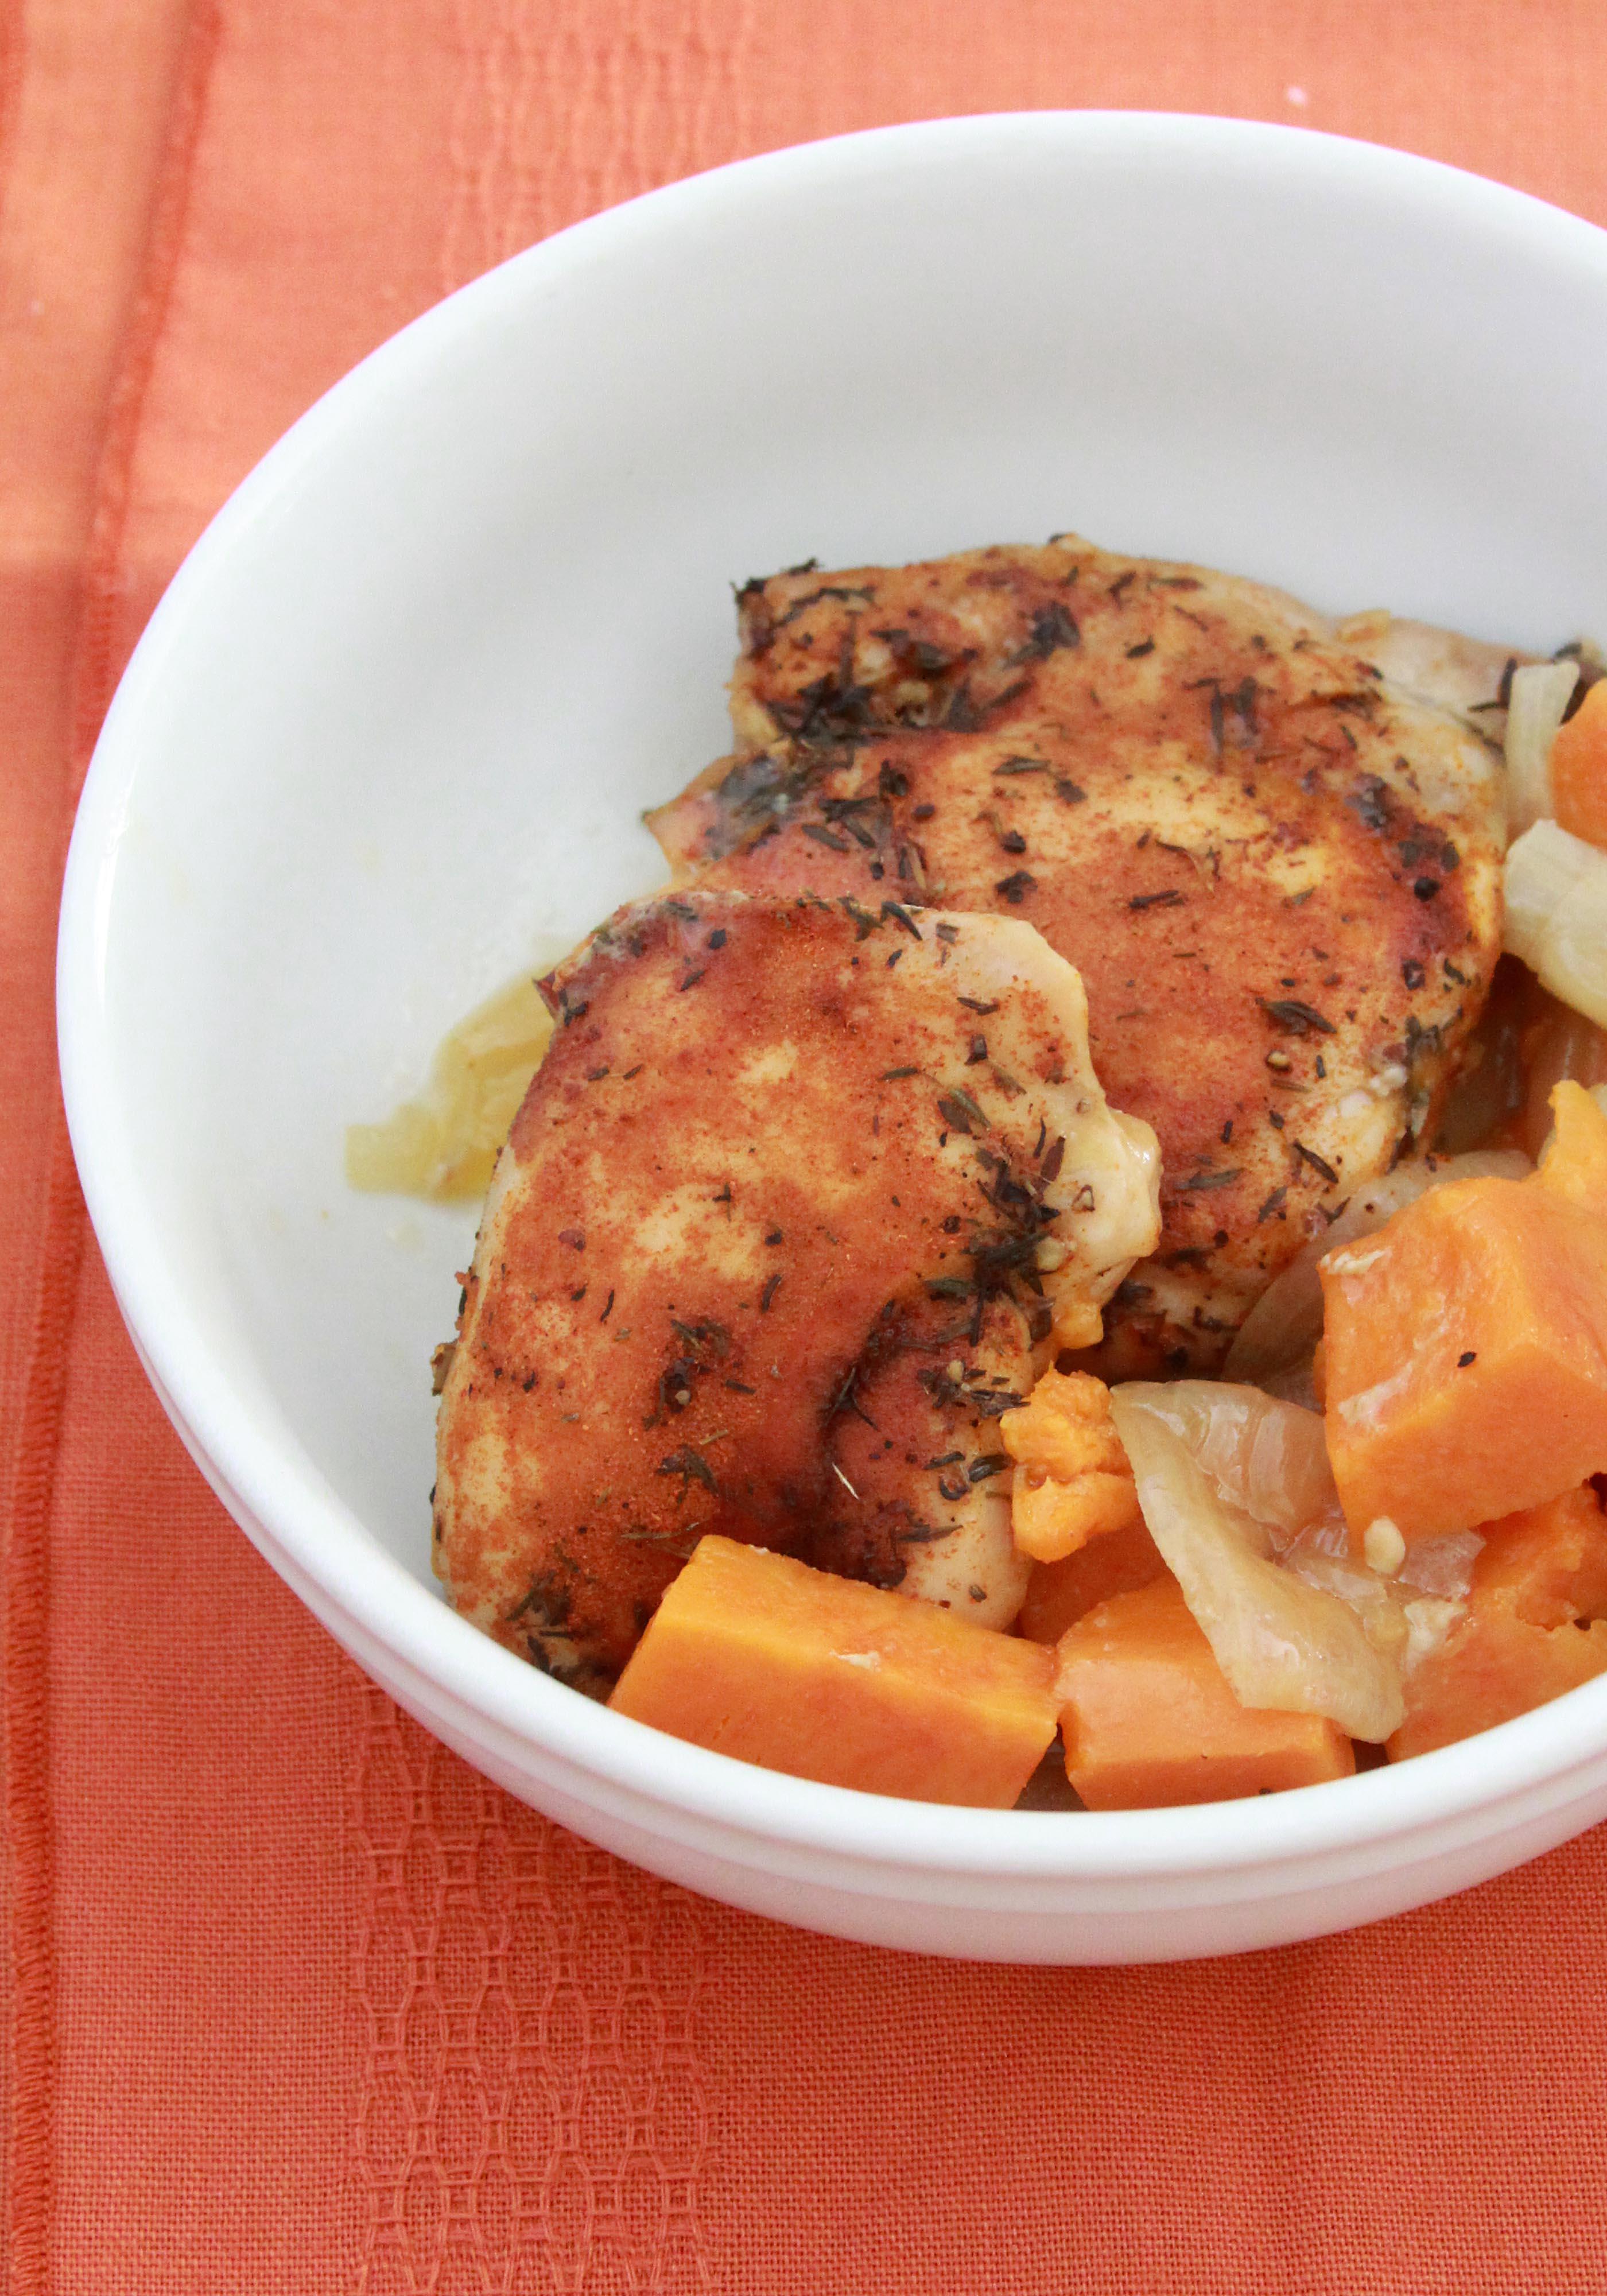 Ginger, Coriander And Orange Braised Chicken Recipes — Dishmaps